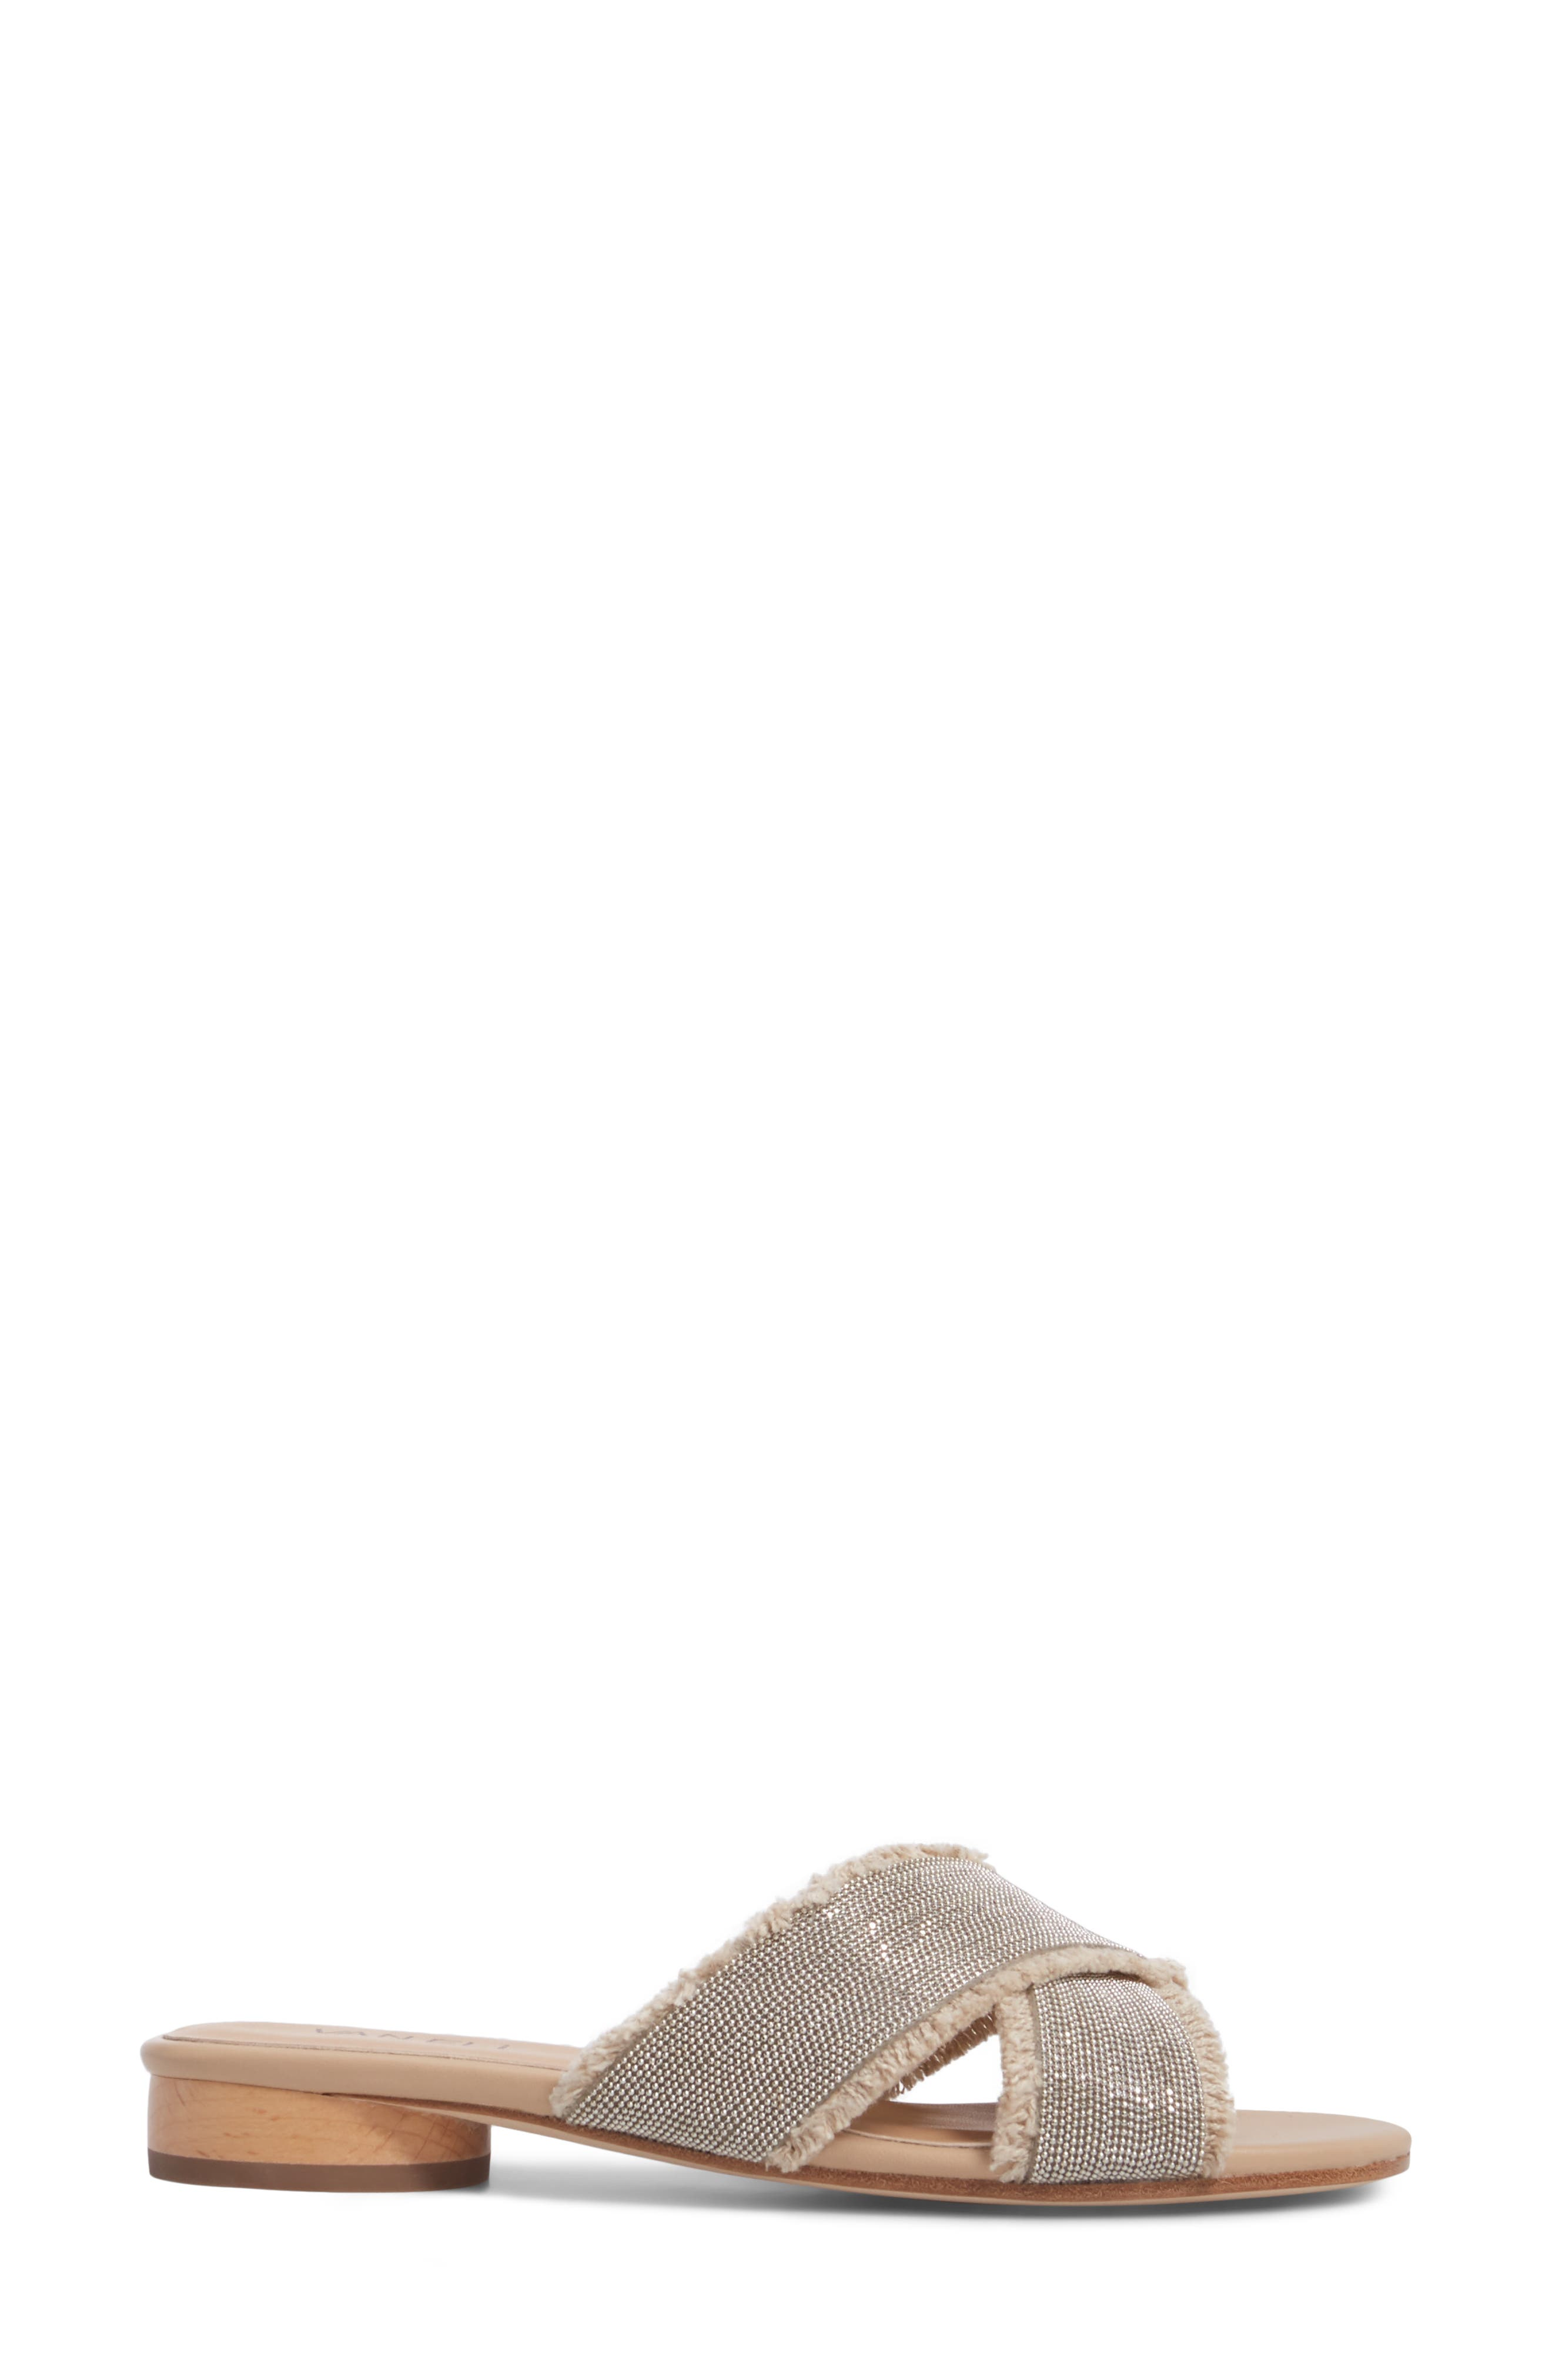 Baret Slide Sandal,                             Alternate thumbnail 3, color,                             Natural Fabric